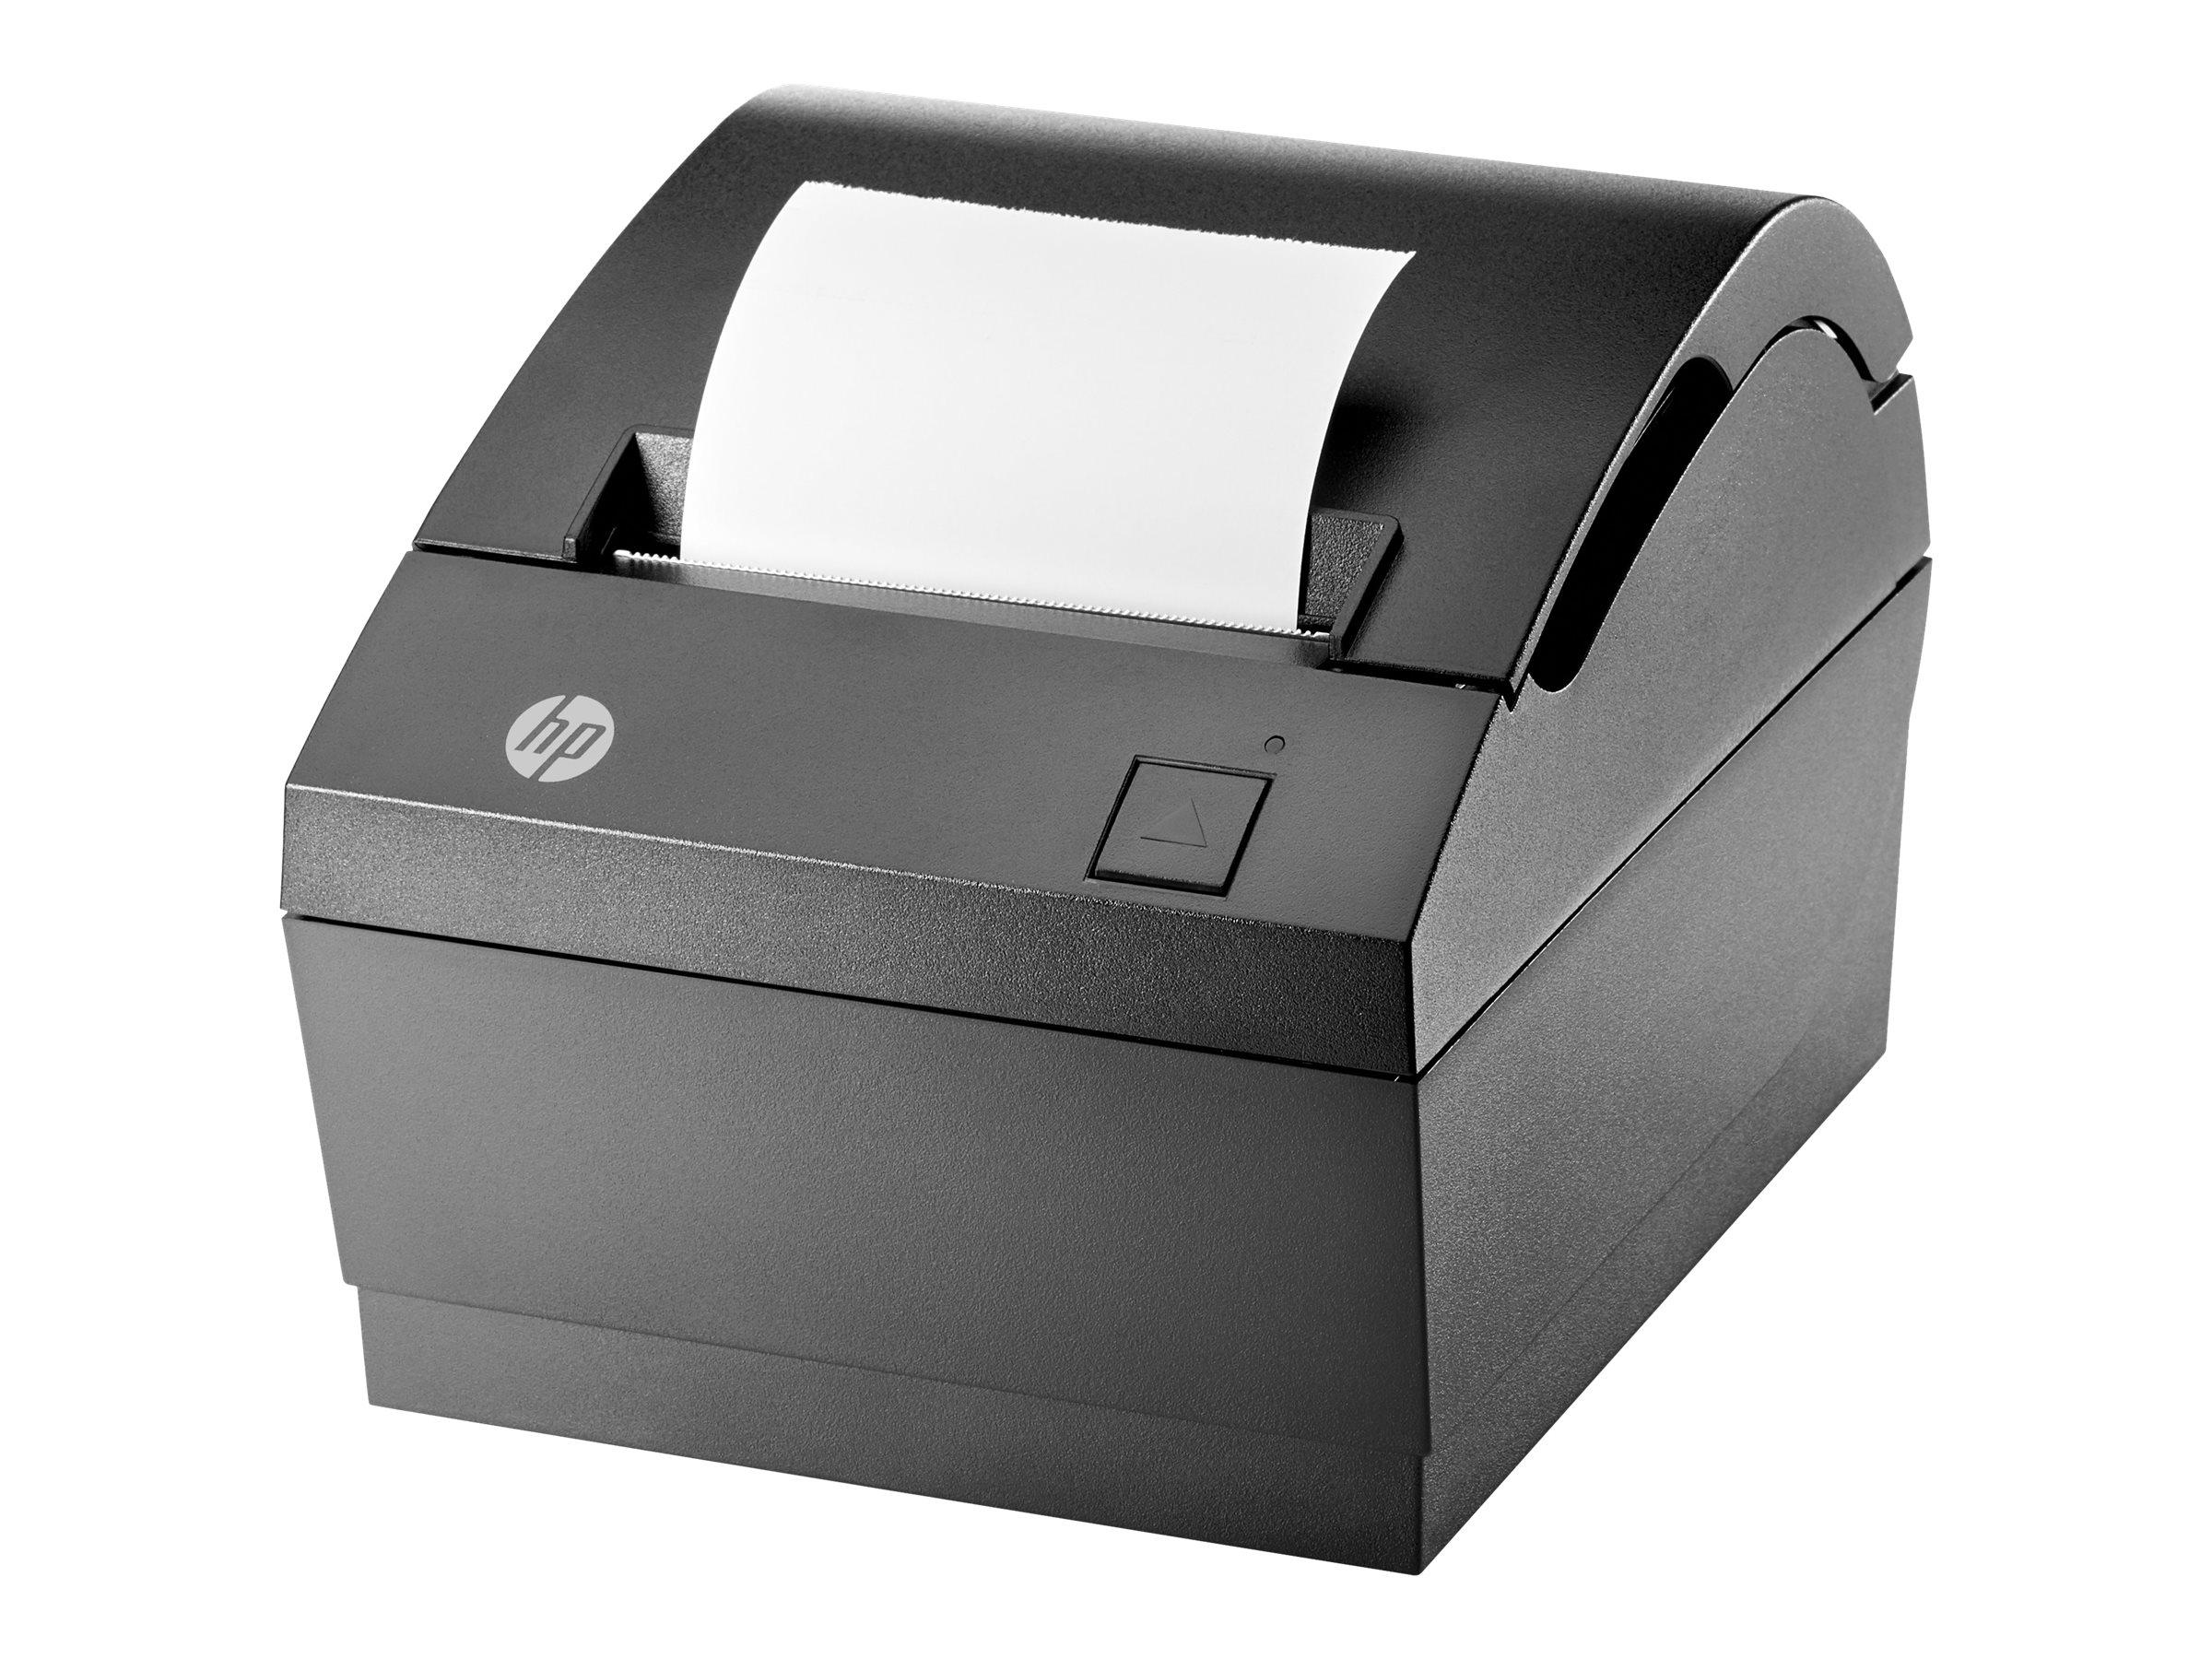 HP Value Receipt Printer II - Belegdrucker - Thermopapier - 80 x 90 mm - 203 dpi - bis zu 180 mm/Sek.